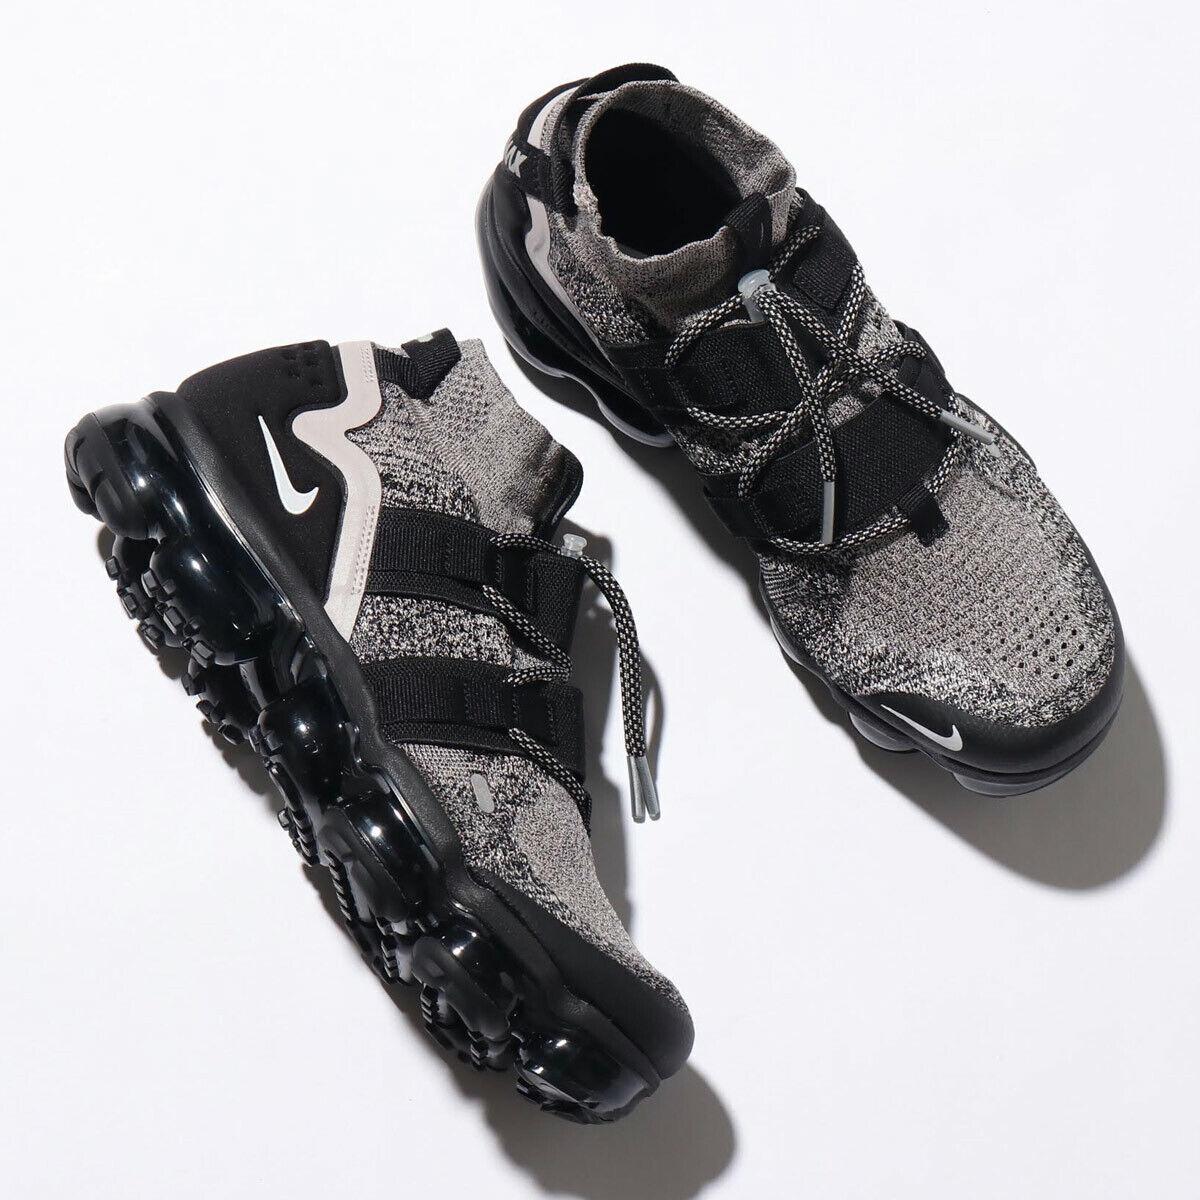 Nike Vapormax Utility Sneakers New Moon Particle Black White Oreo Ah6834-201